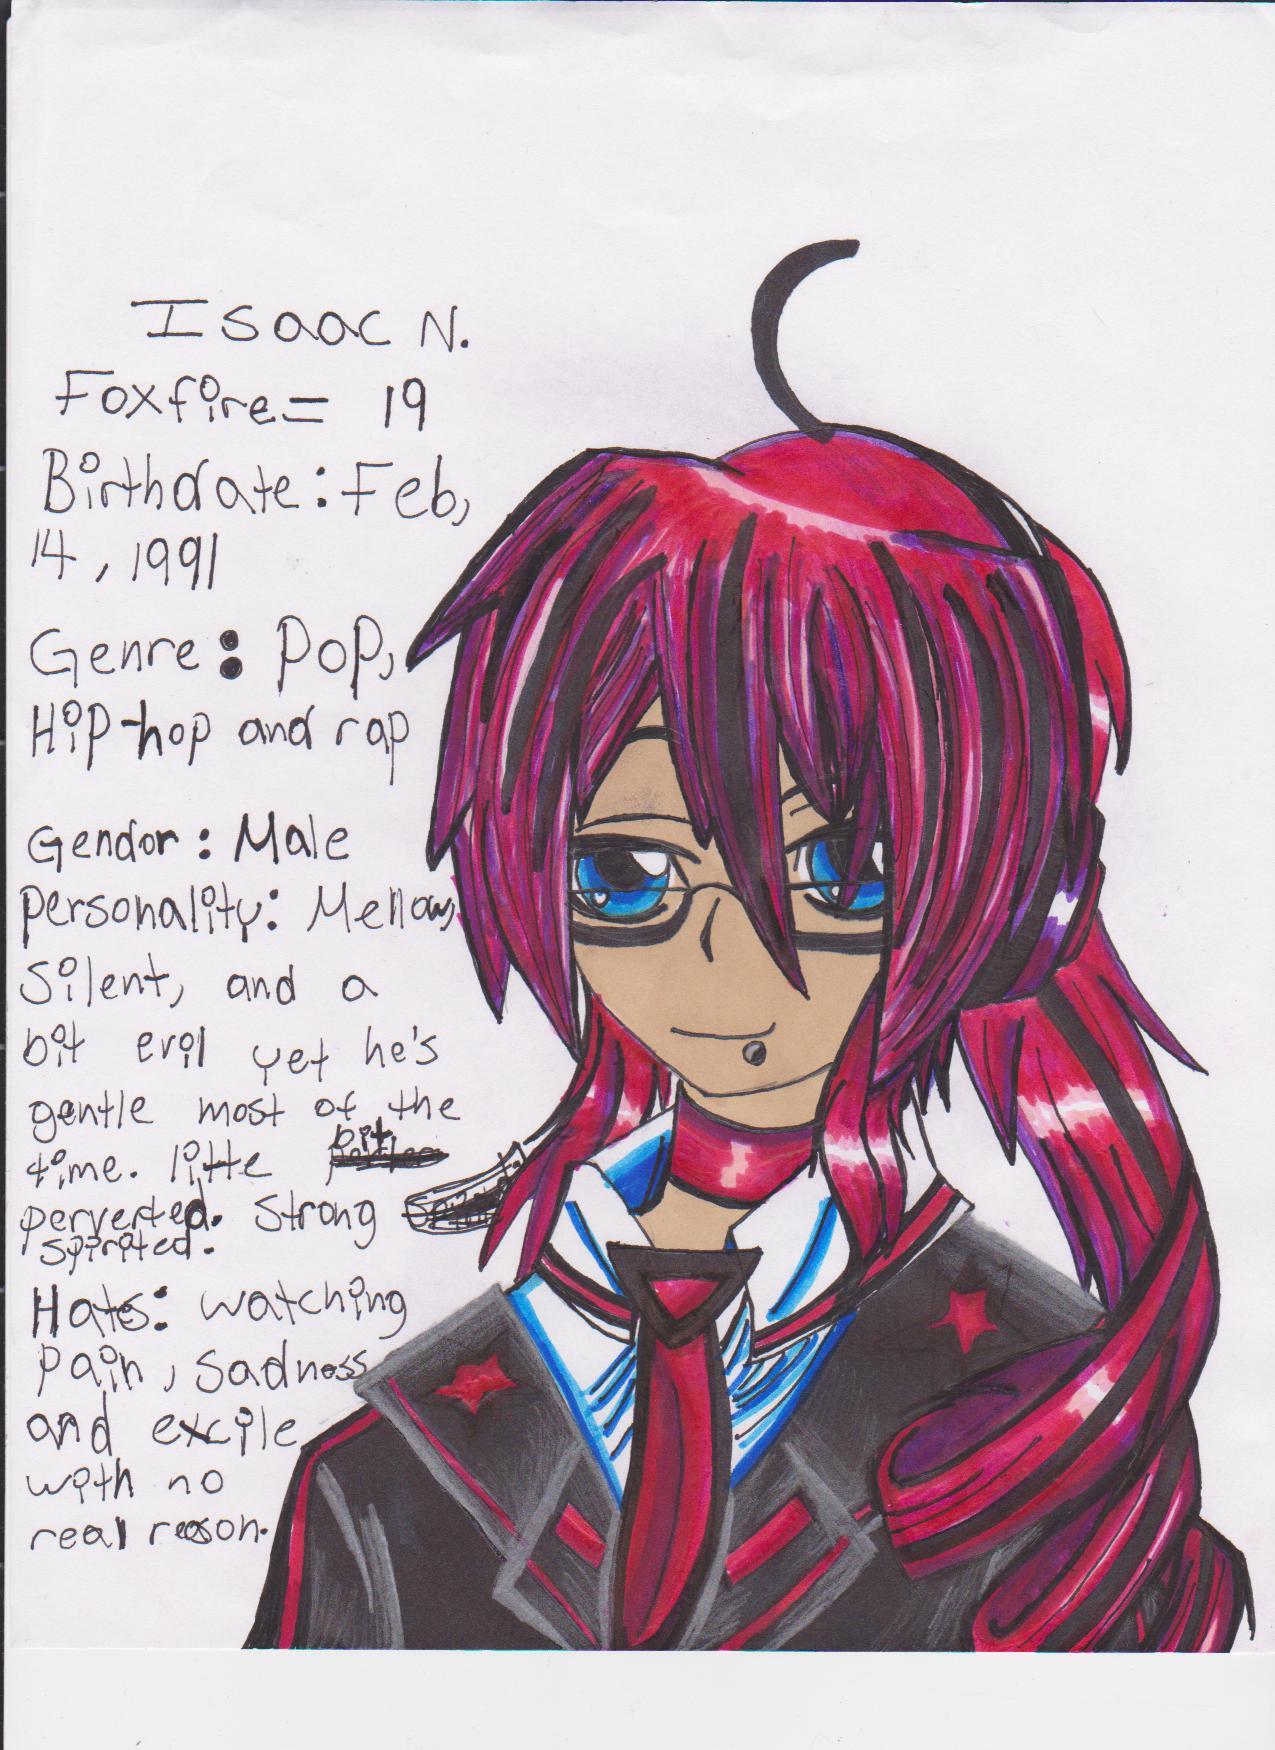 isaac's profile